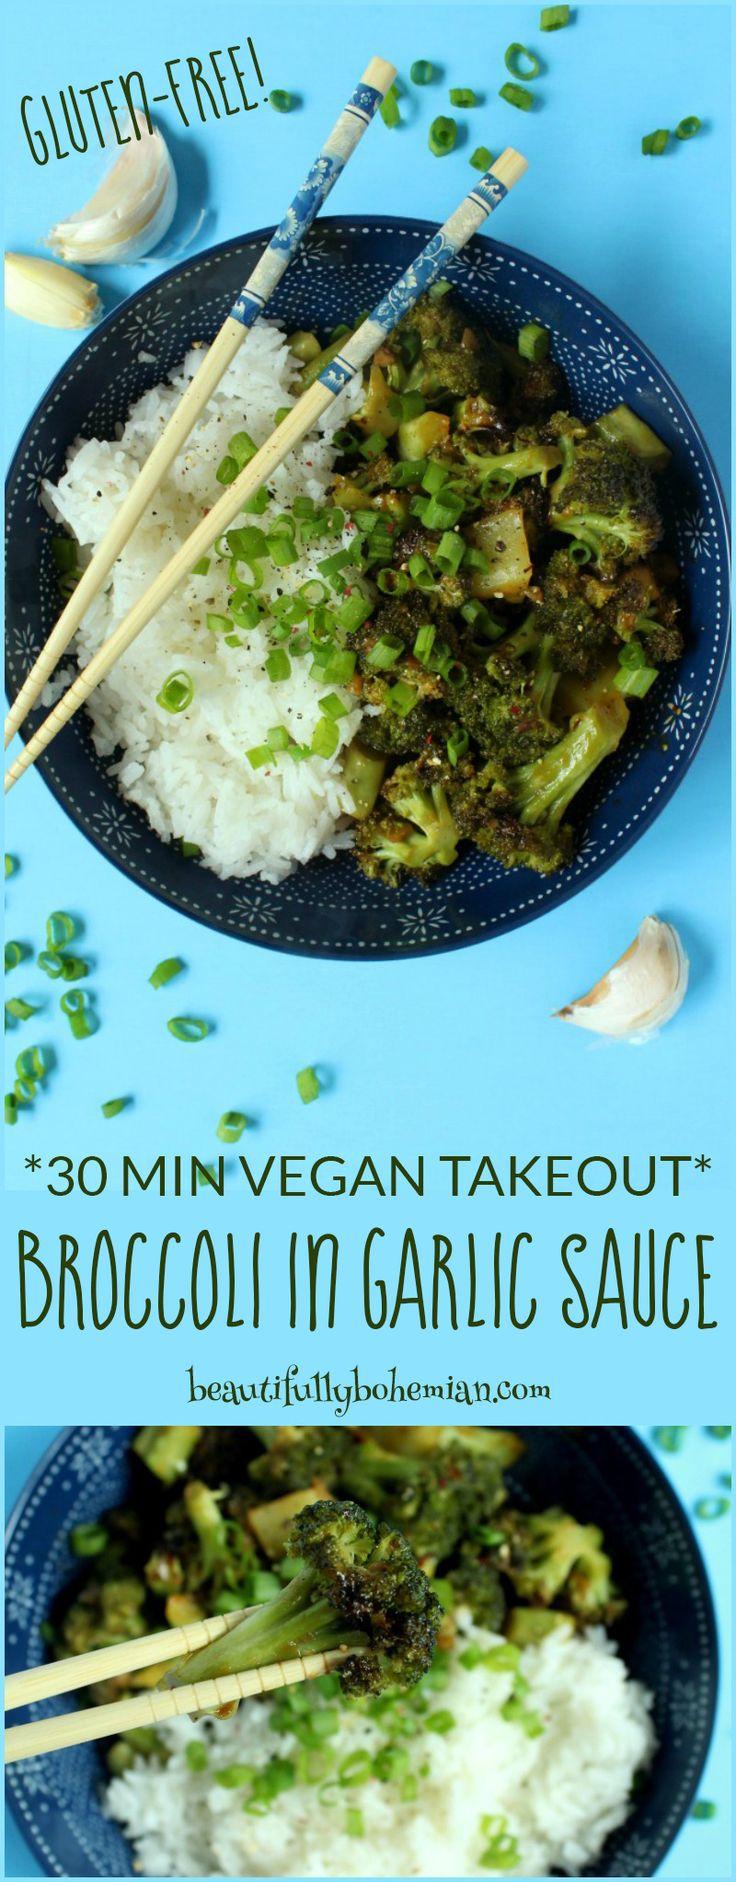 30 Minute Vegan Takeout: Broccoli in Garlic Sauce (Gluten-Free!) - Beautifully Bohemian